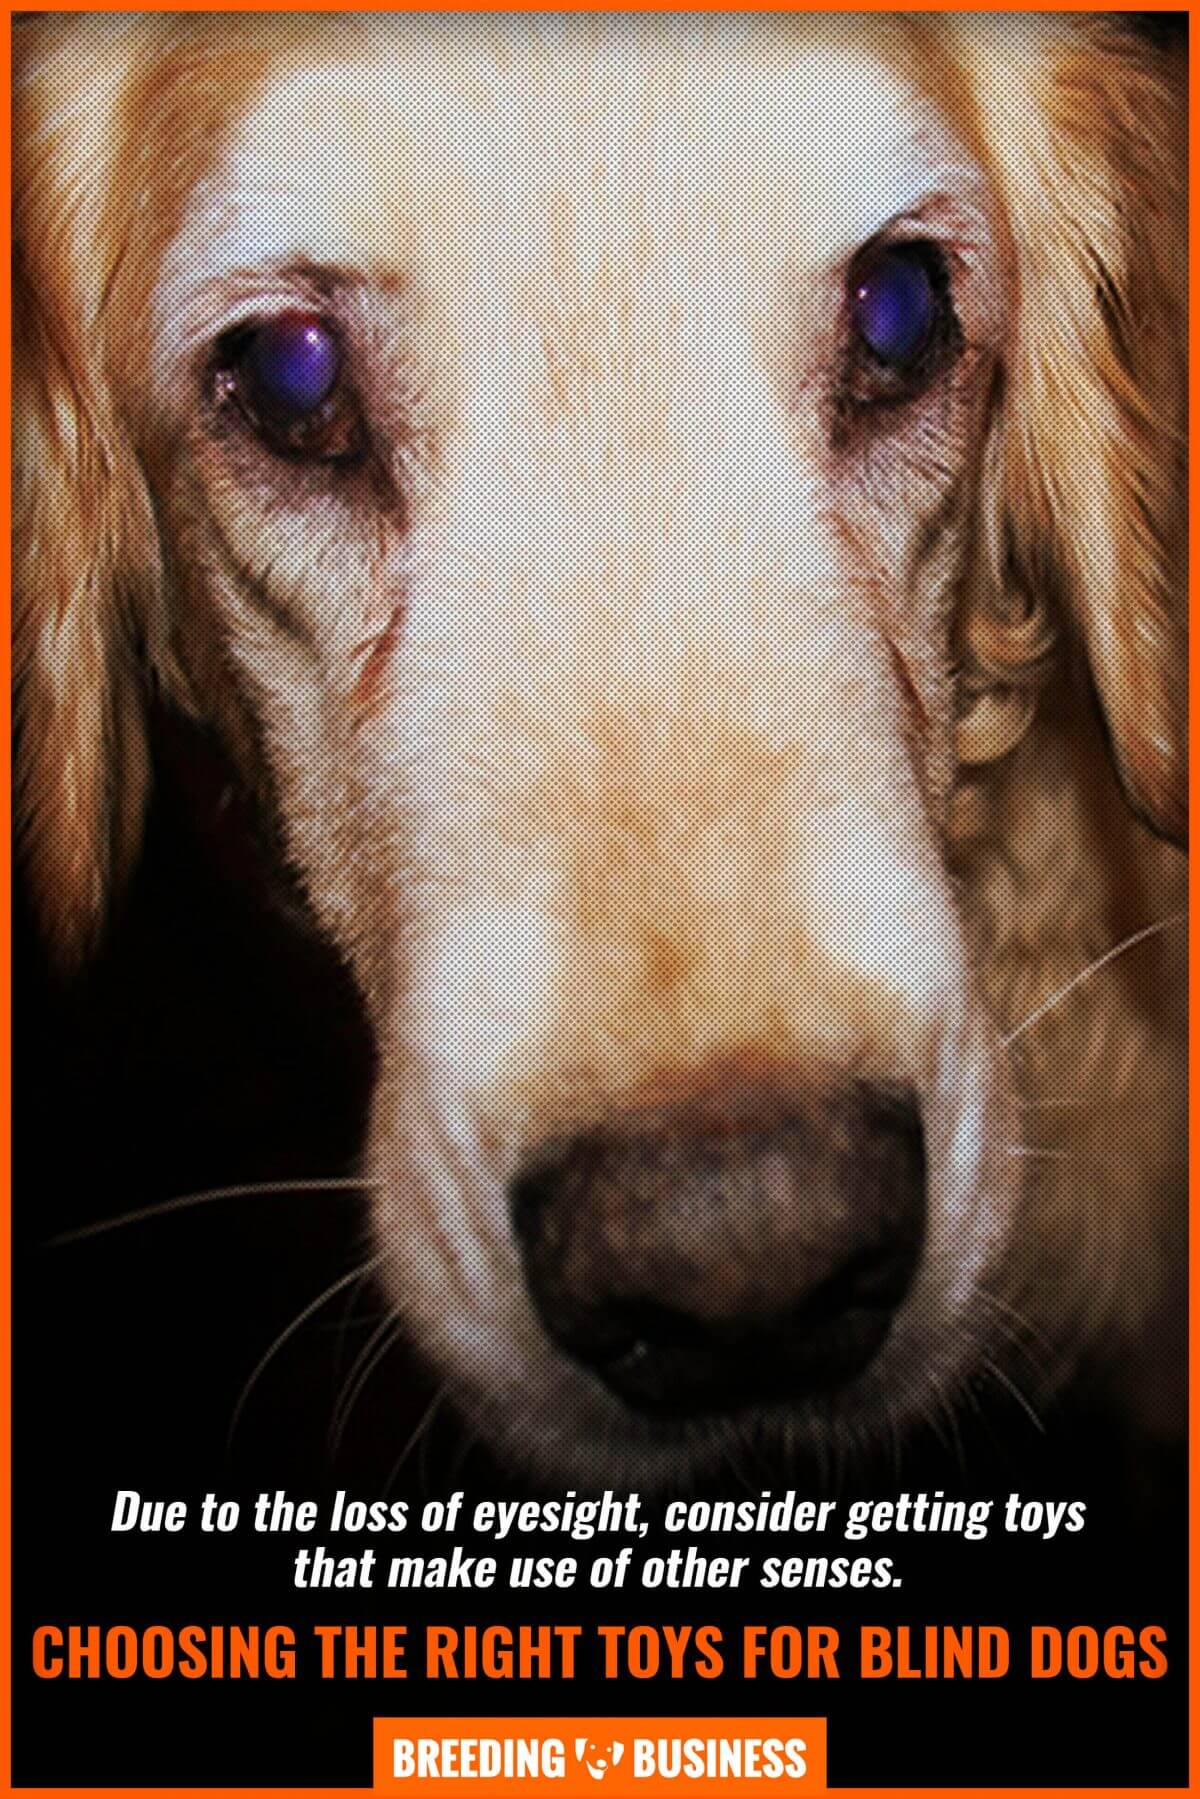 choosing toys for blind dogs